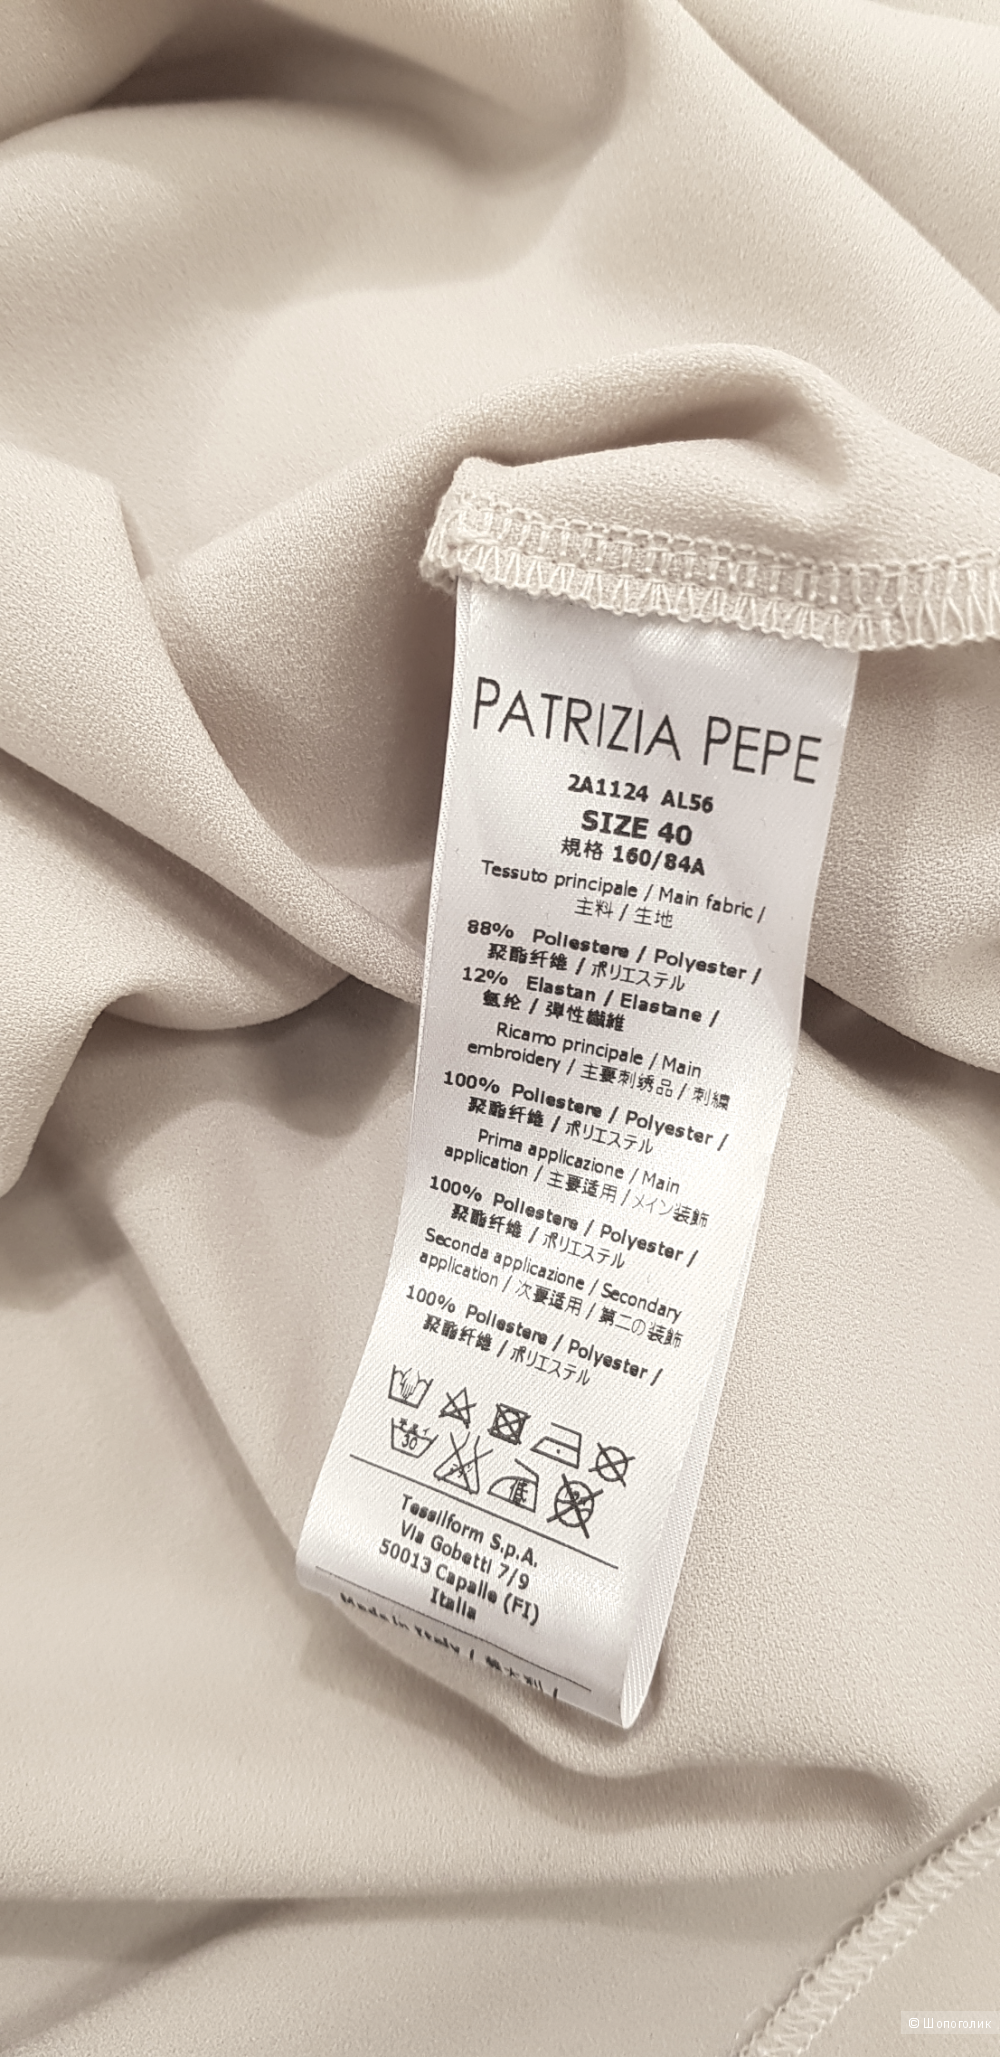 Платье .Patrizia Pepe. 40it/40/42